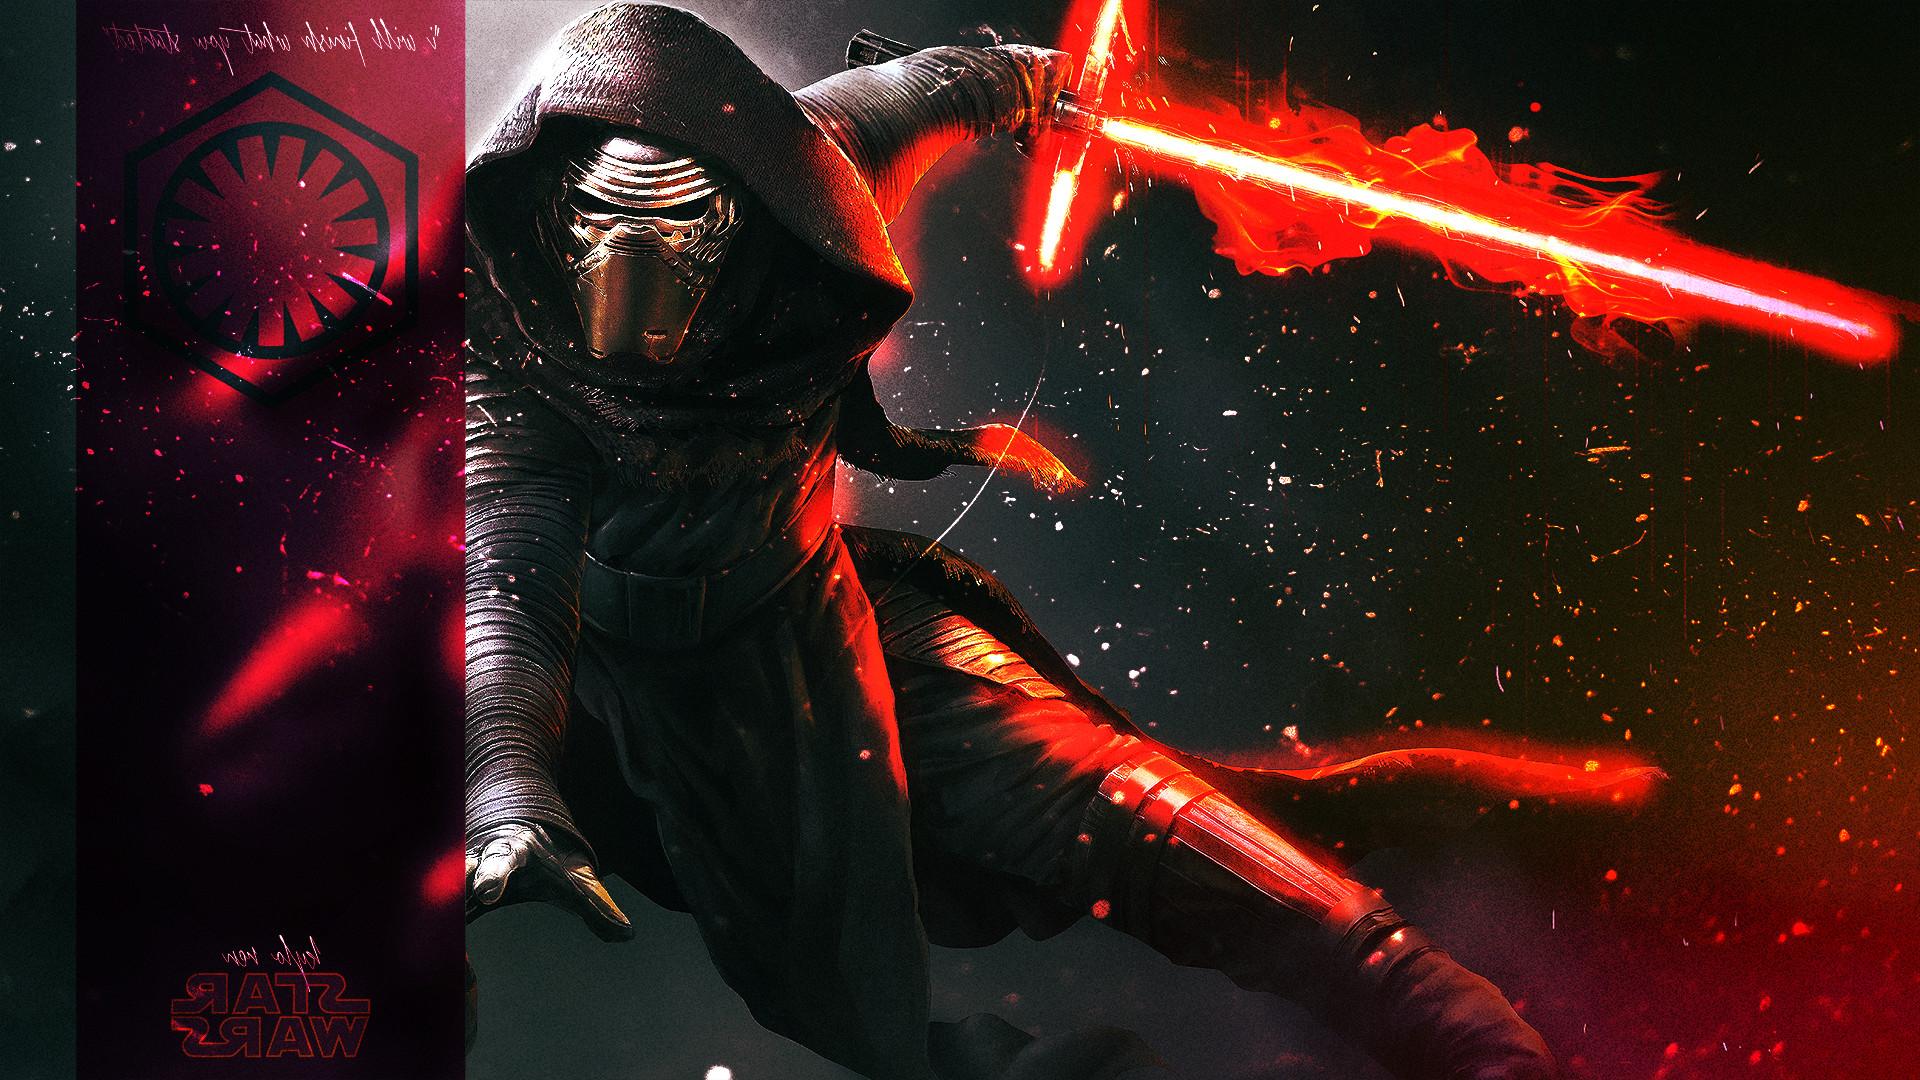 star wars wallpaper | Star Wars Hd Wallpaper | Star Wars | Pinterest | Star  wars wallpaper and Trek